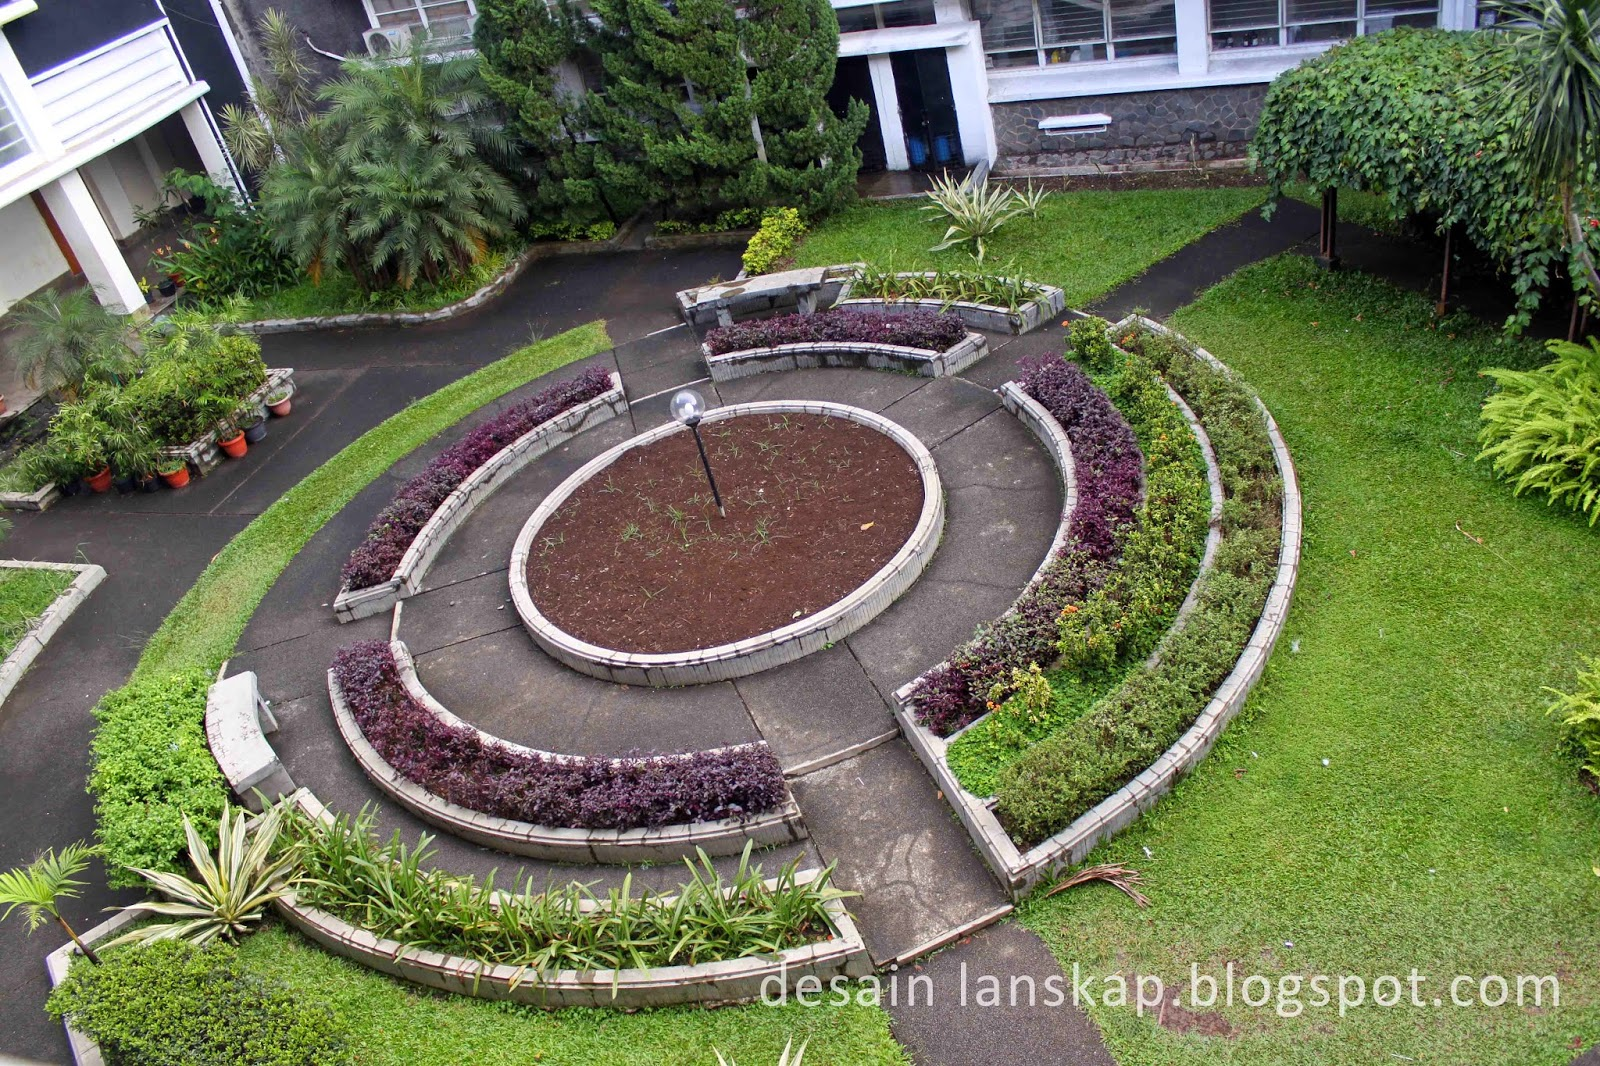 jurusan arsitektur lanskap; desain lanskap; desain taman; taman geometris